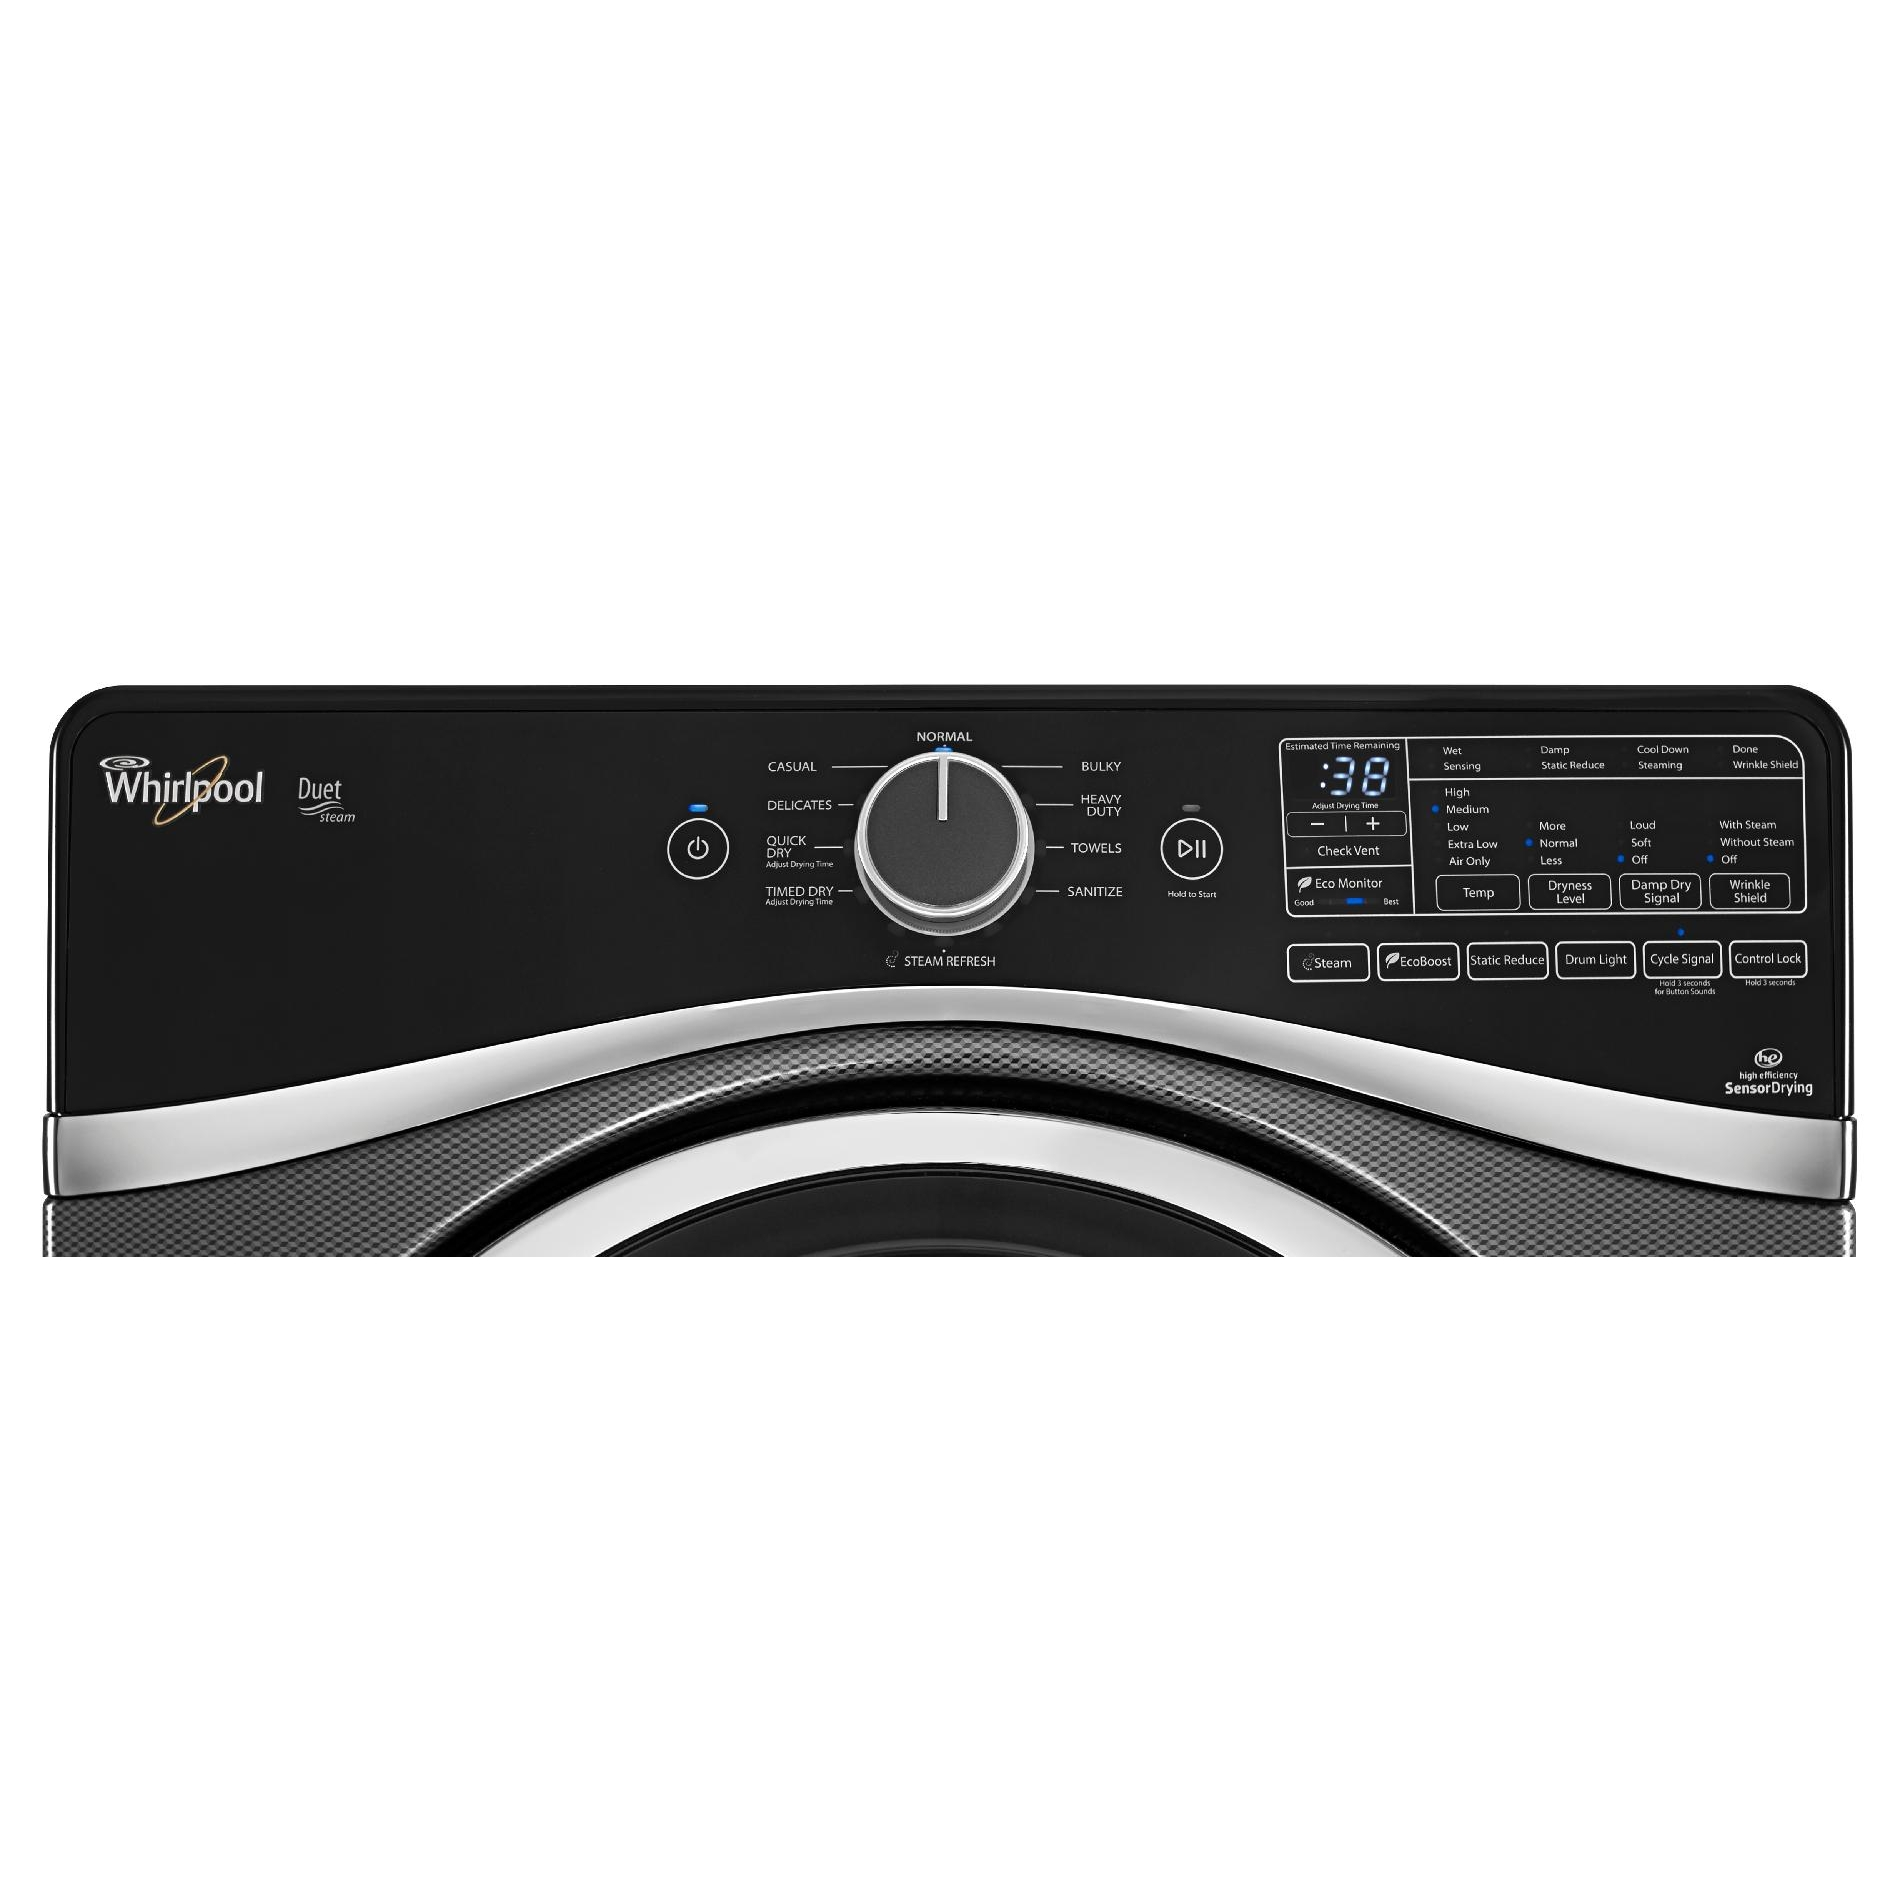 Whirlpool WGD97HEDBD 7.4 cu. ft. Duet® Gas Dryer w/ SilentSteel™ Drum - Black Diamond